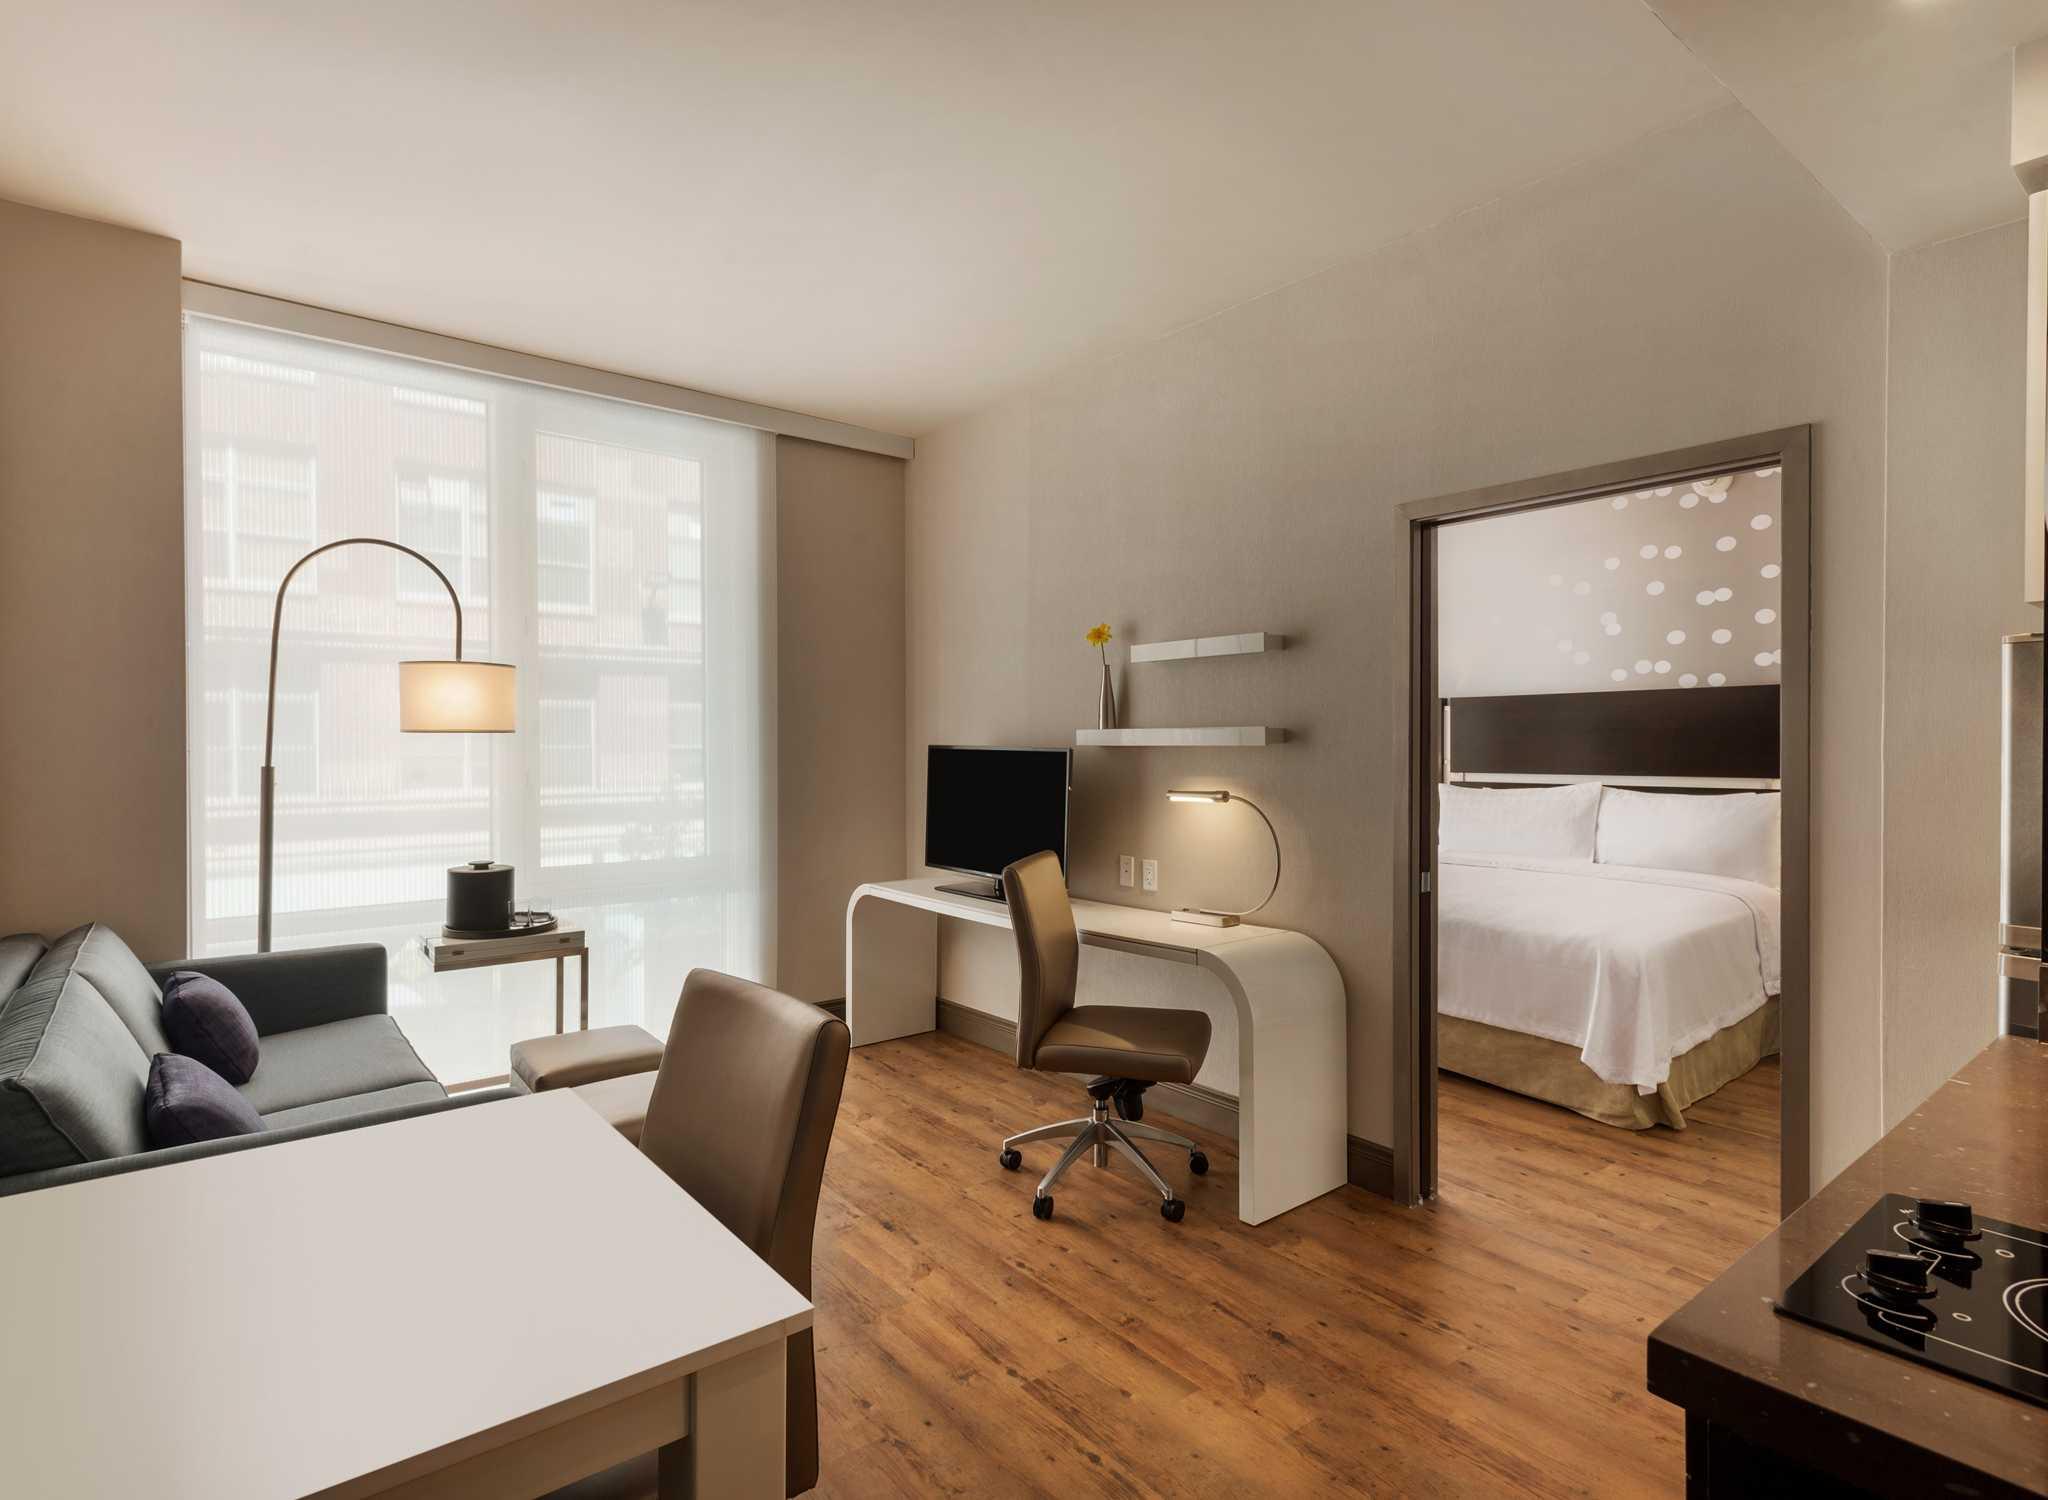 Hotel per soggiorni prolungati Homewood Suites New York/Midtown ...